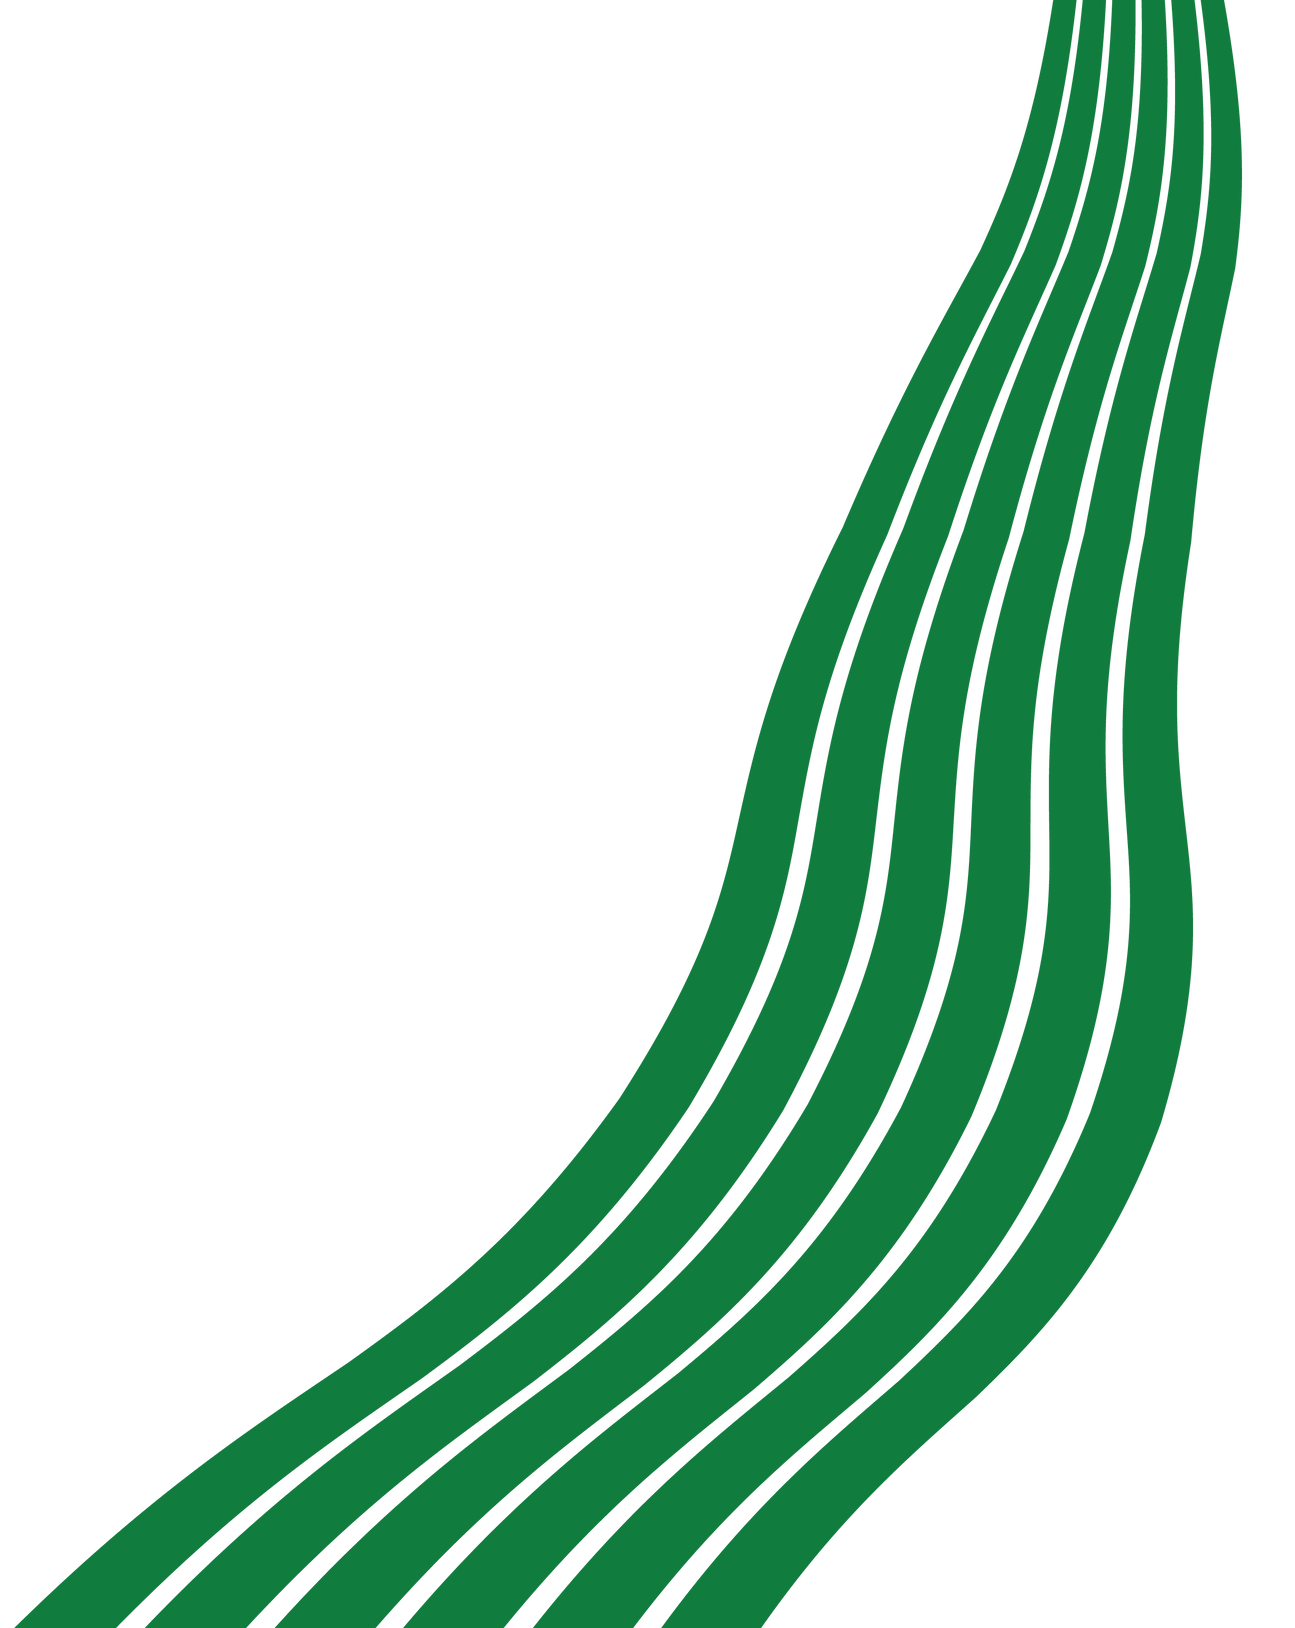 road-green-cmyk-2000.png